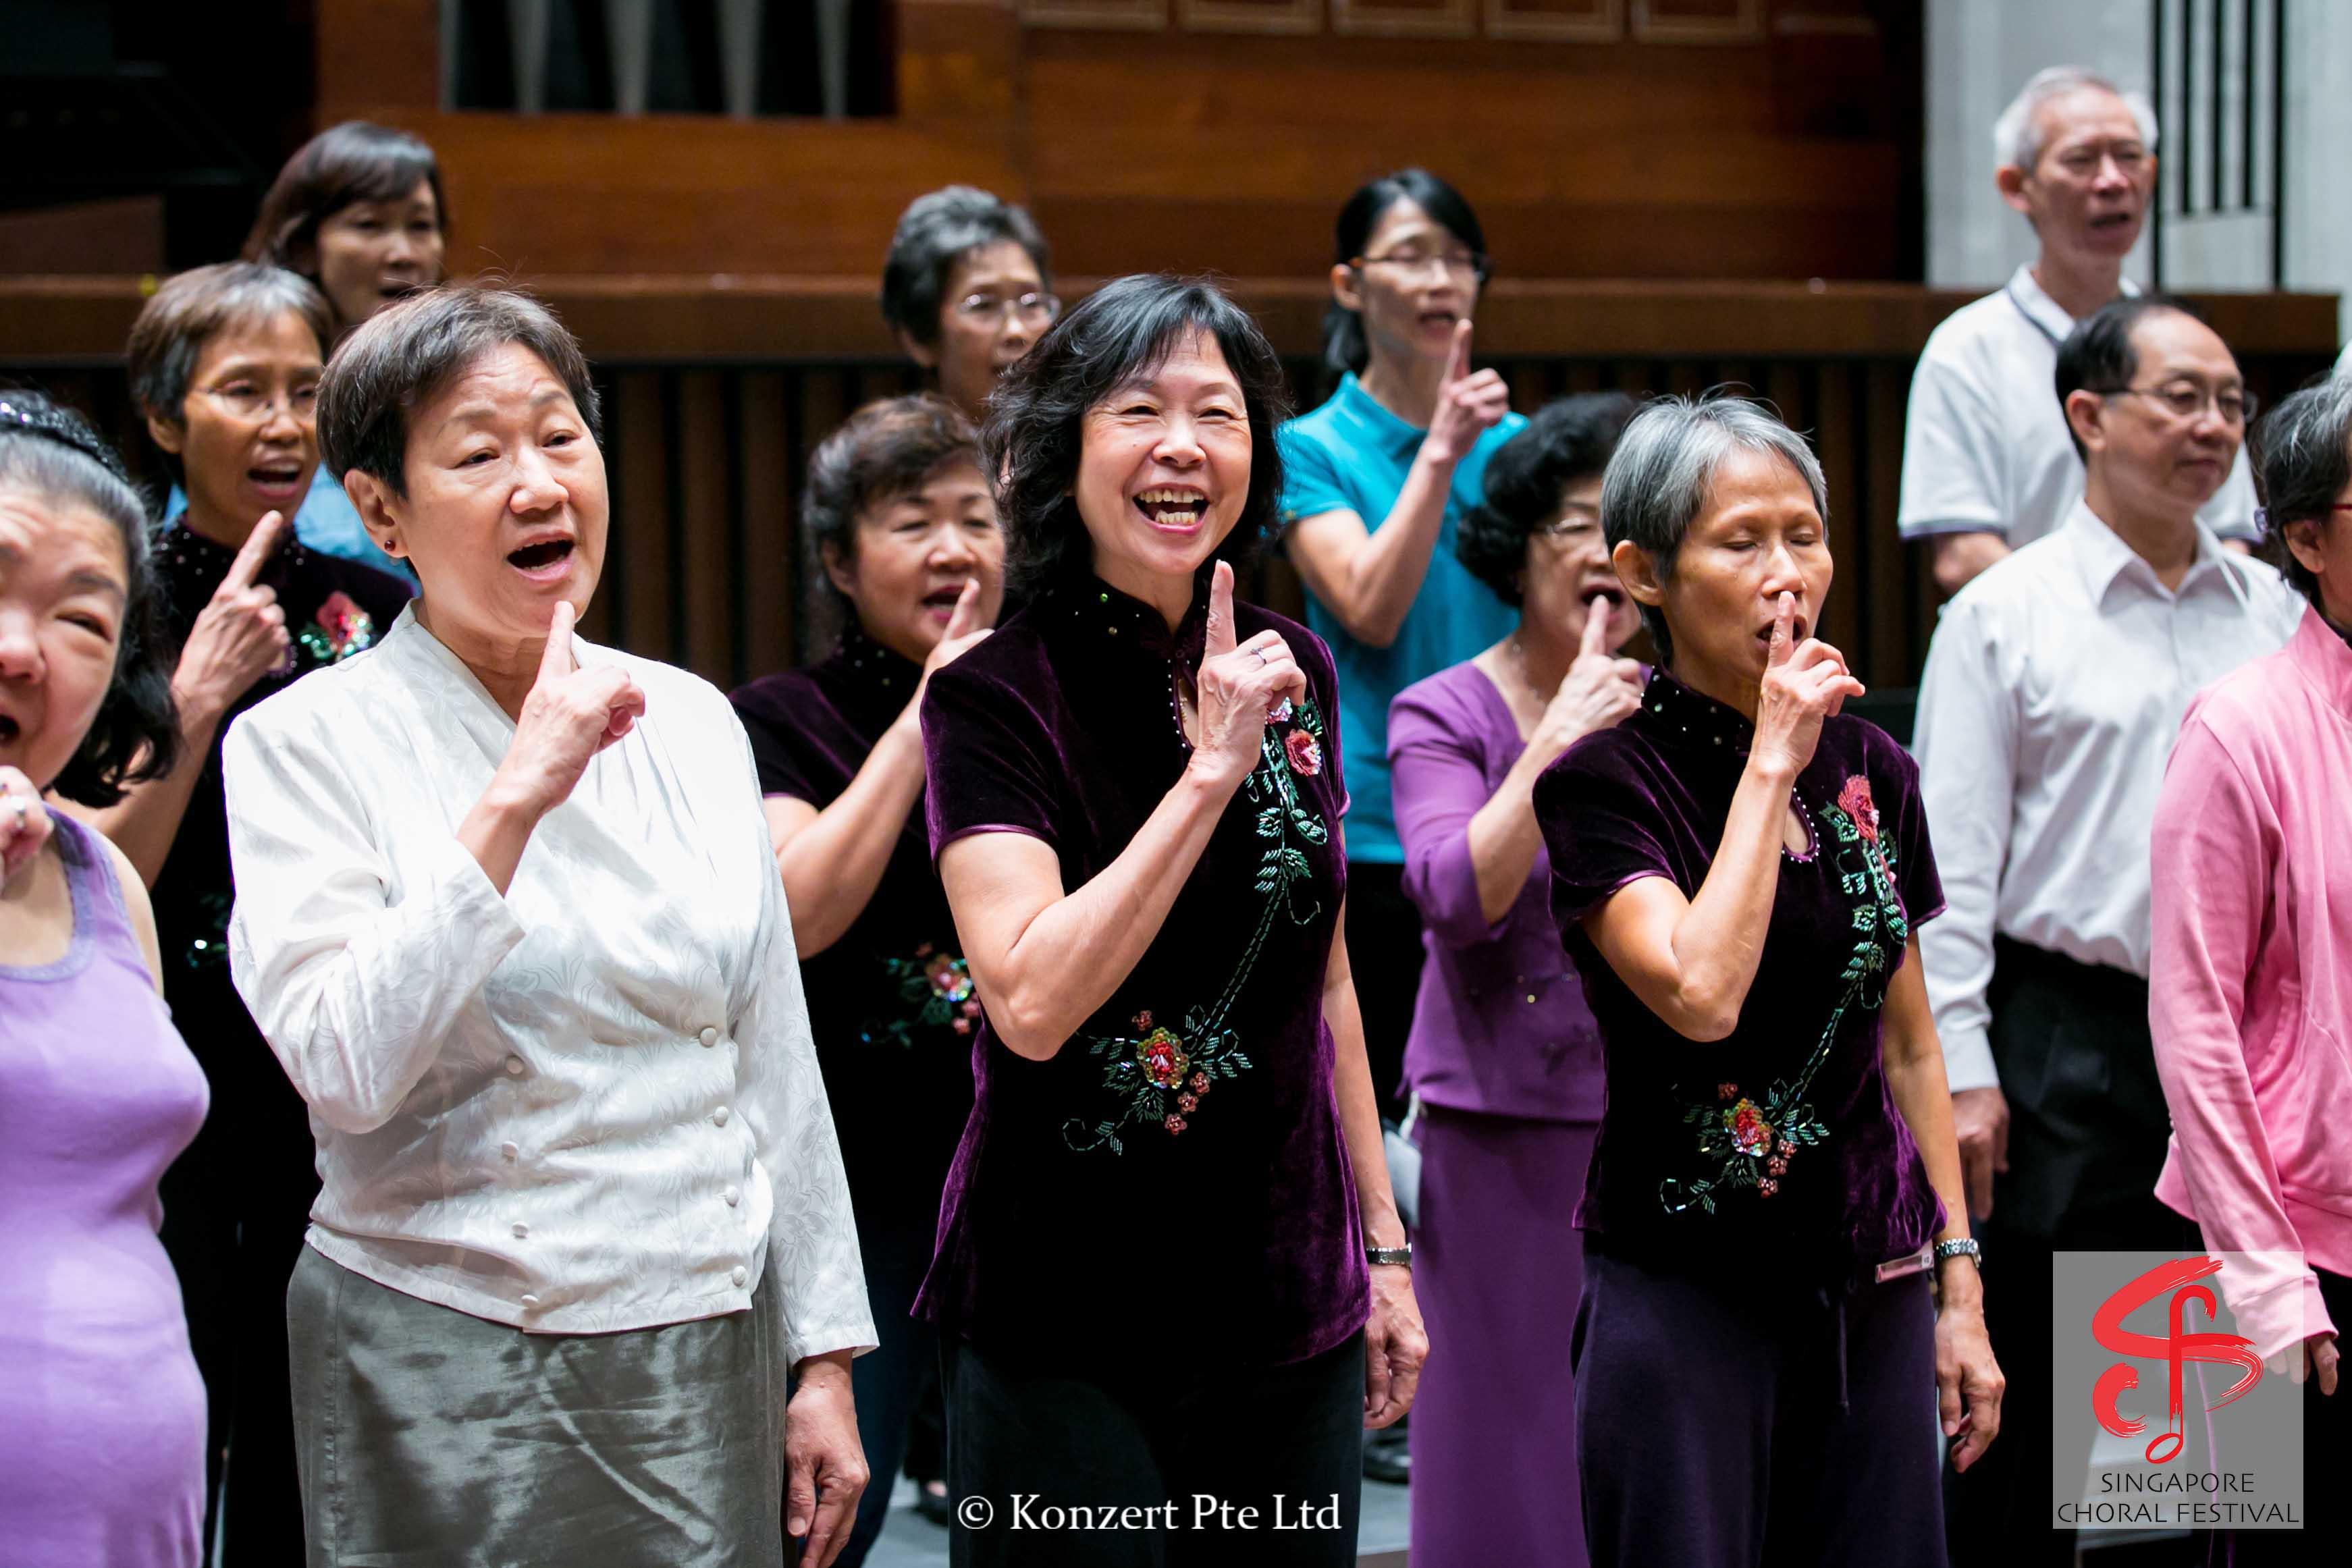 Singapore Choral Festival 8-8-15 (27).jpg